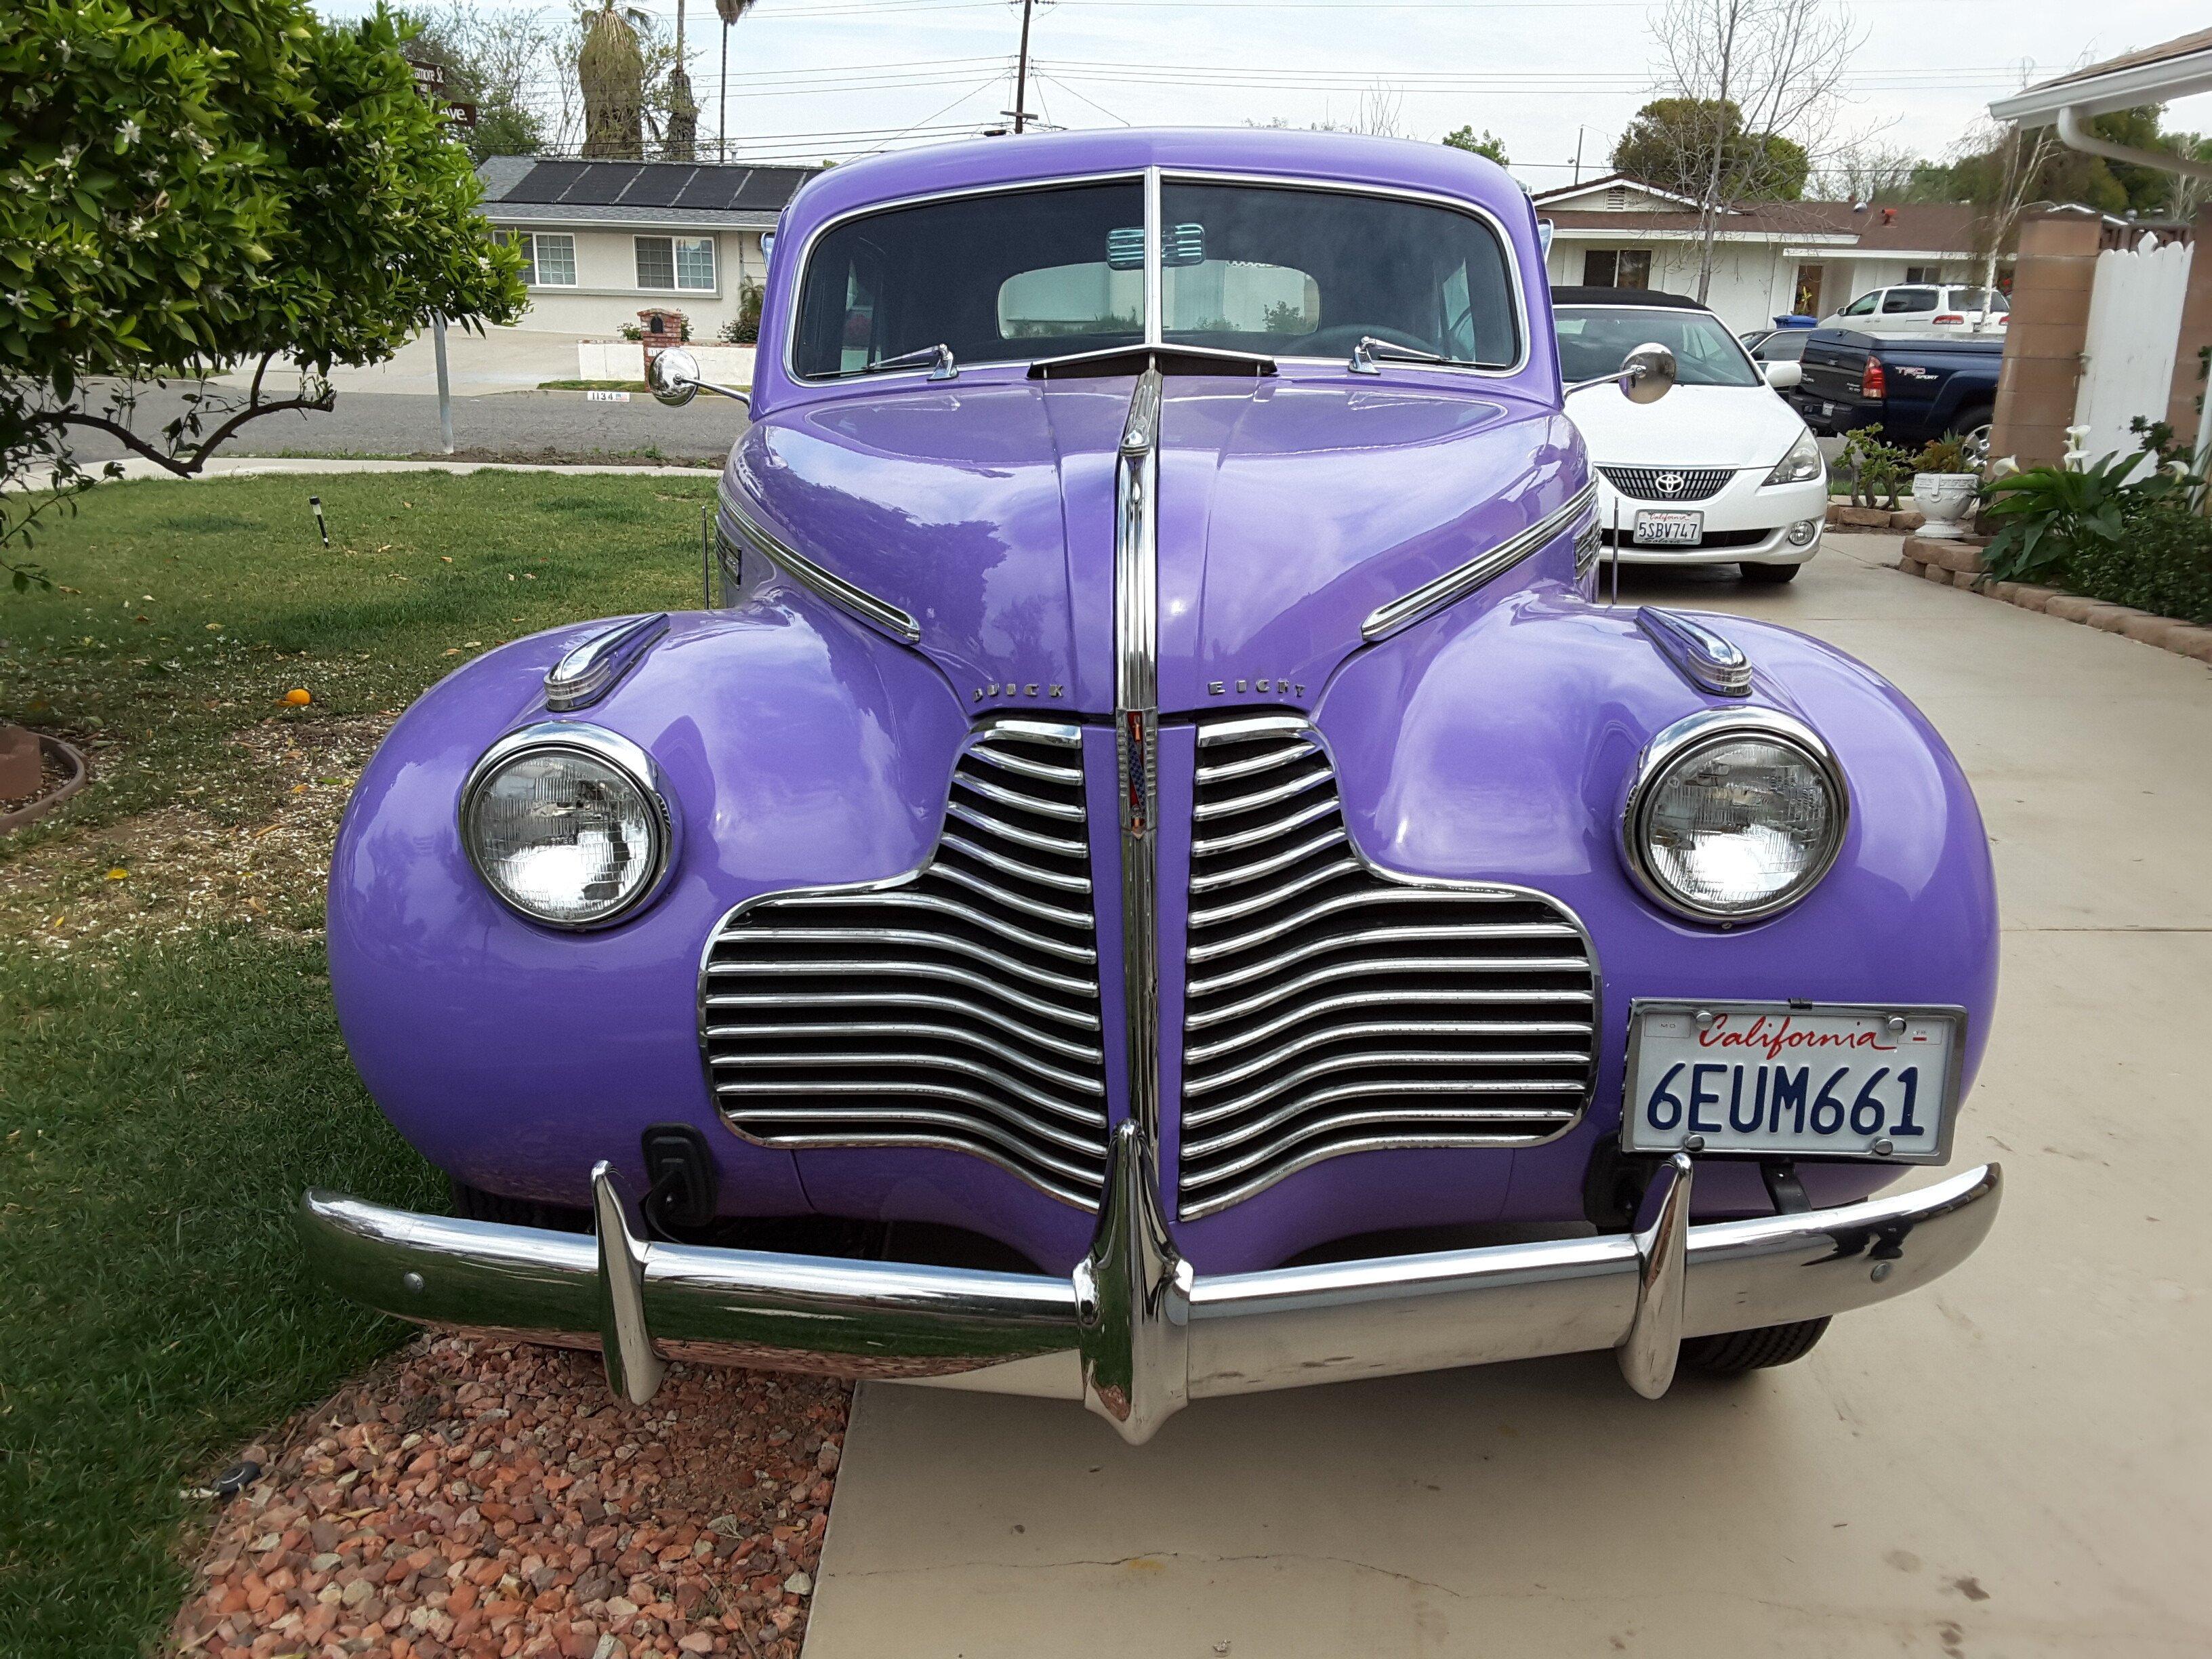 1940 Buick Super antiques Car 100767837 8613c8b581227664da52930db9c9b0ad?r=fit&w=230&s=1 buick classics for sale near ventura, california classics on 1940 buick wiring harness at gsmx.co